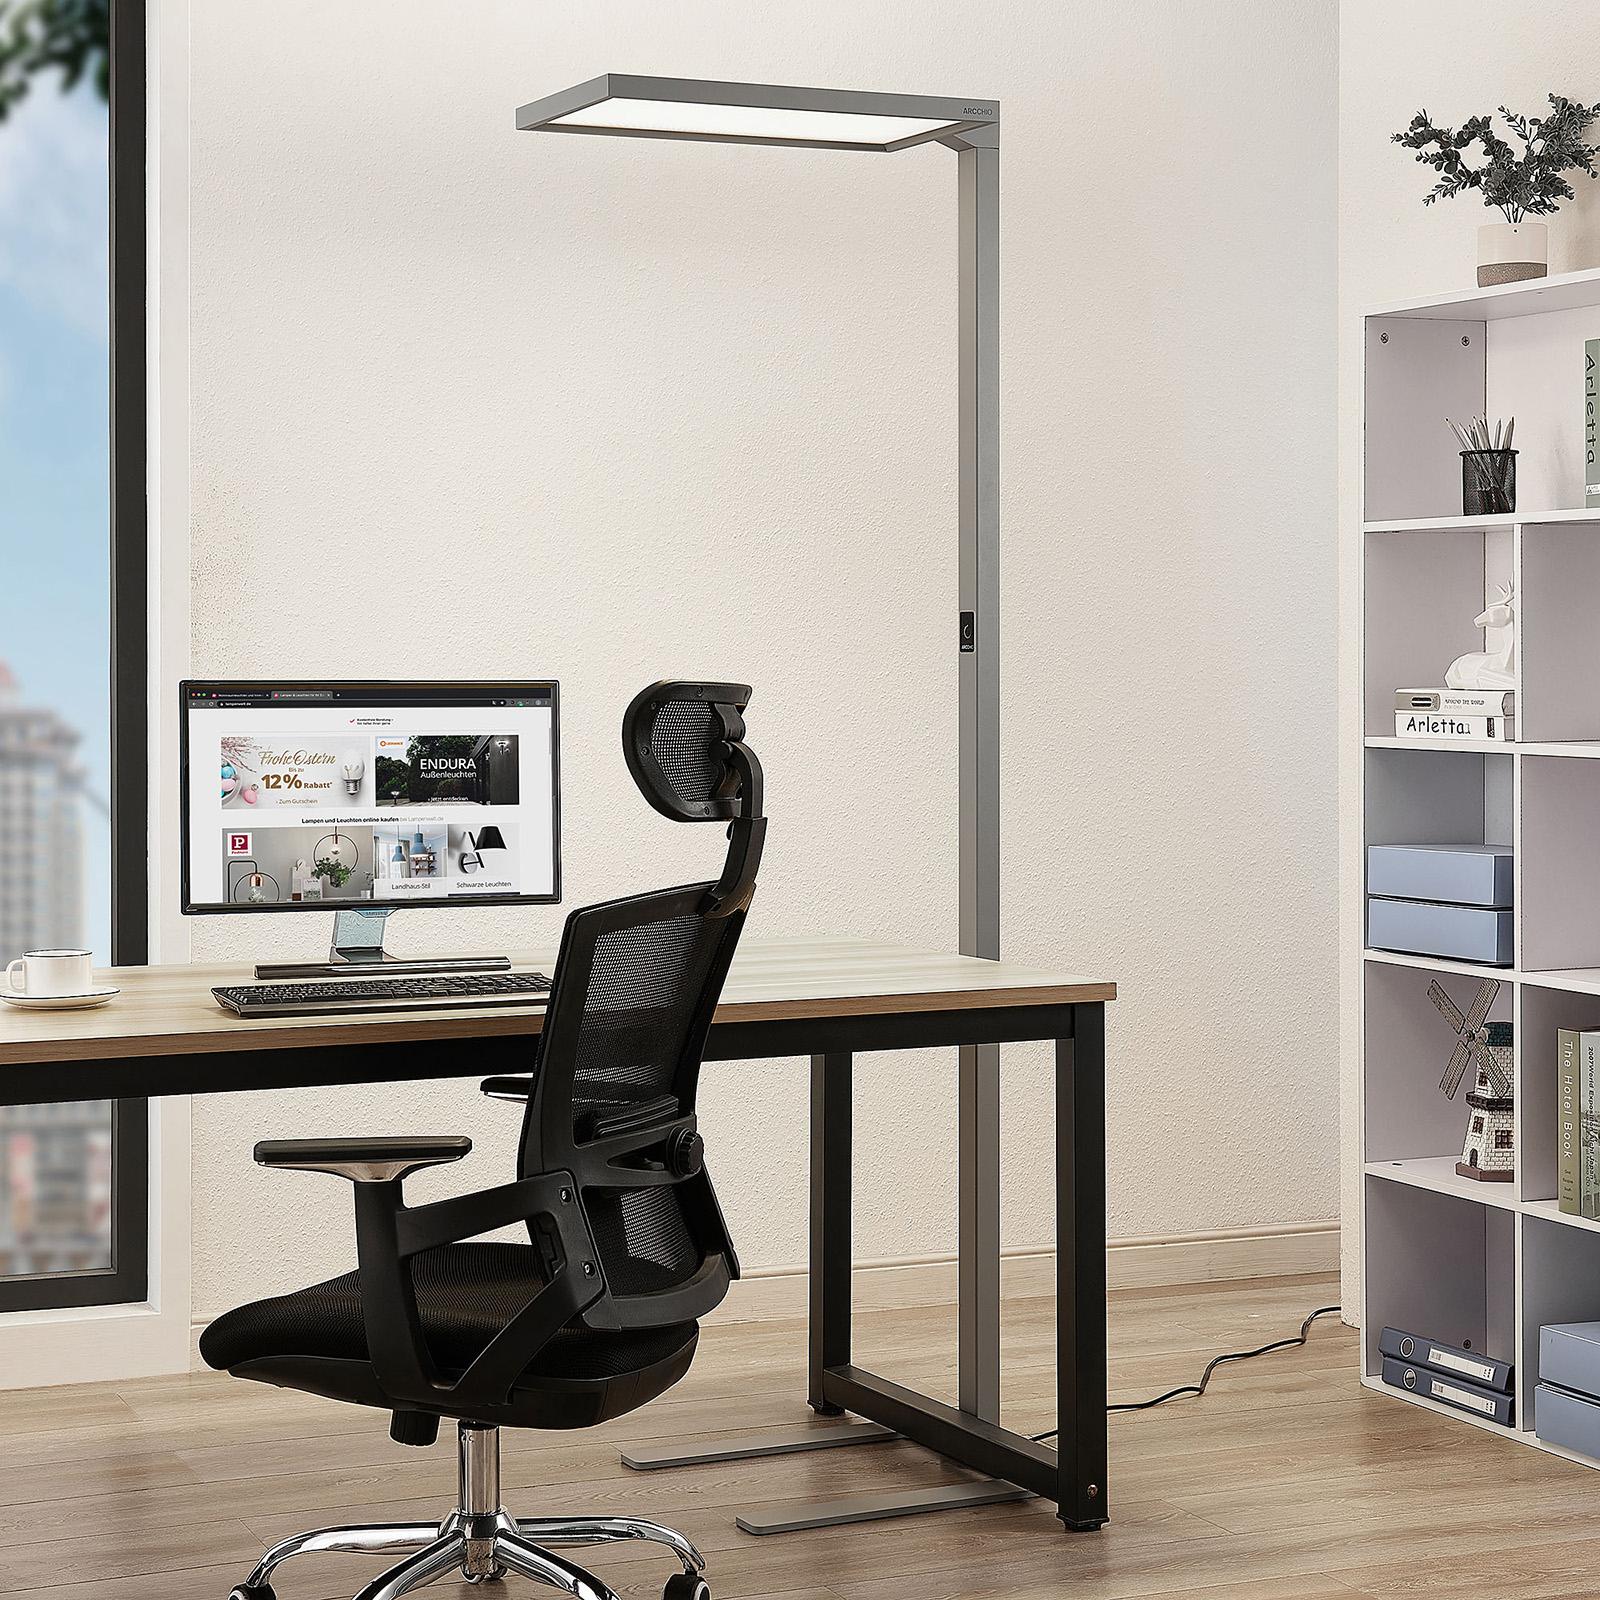 Arcchio Nelus LED-gulvlampe til kontor, dimbar